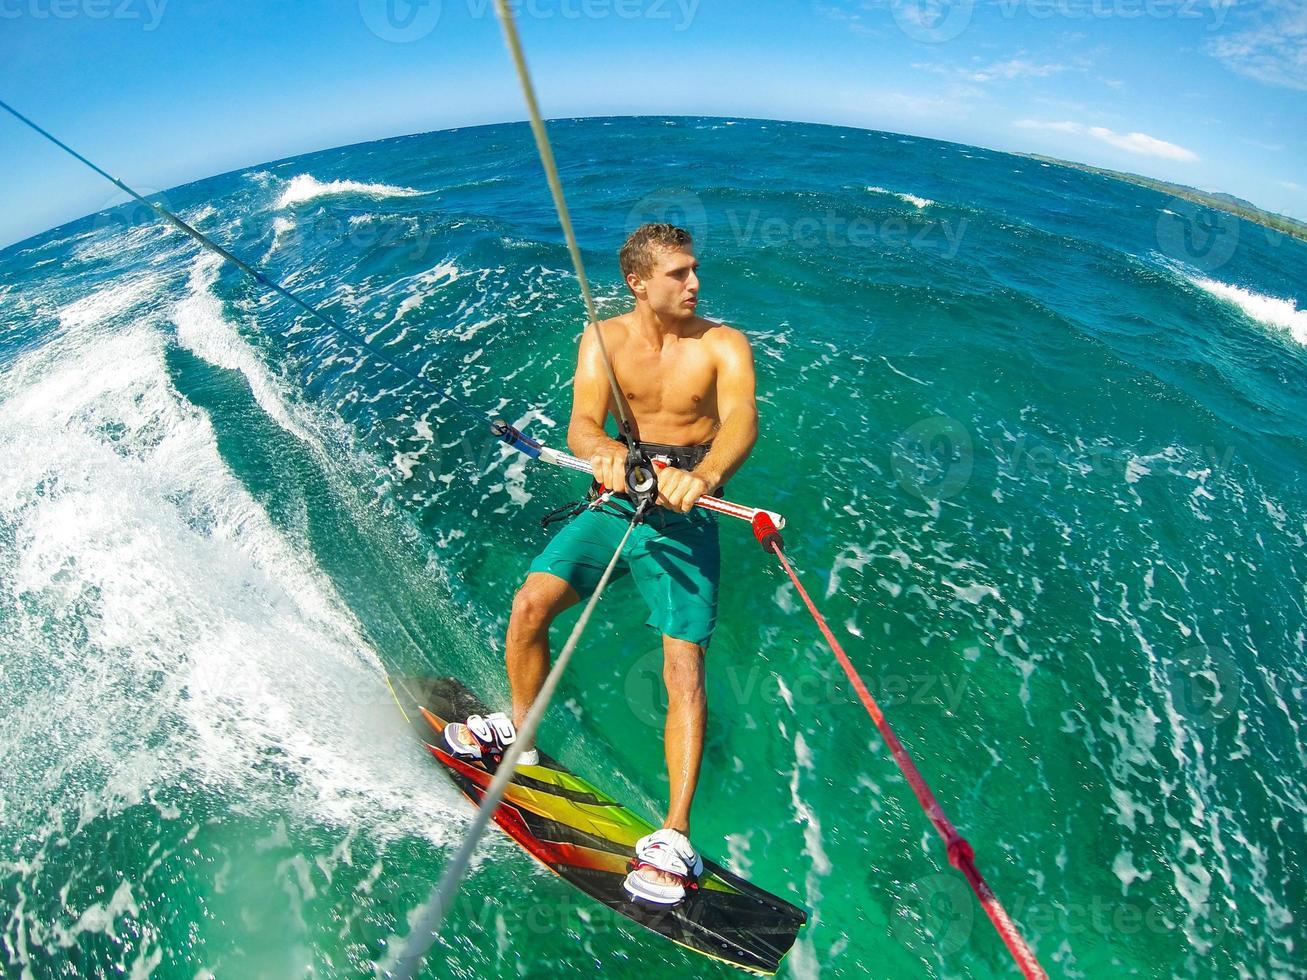 esporte radical, kitesurf foto